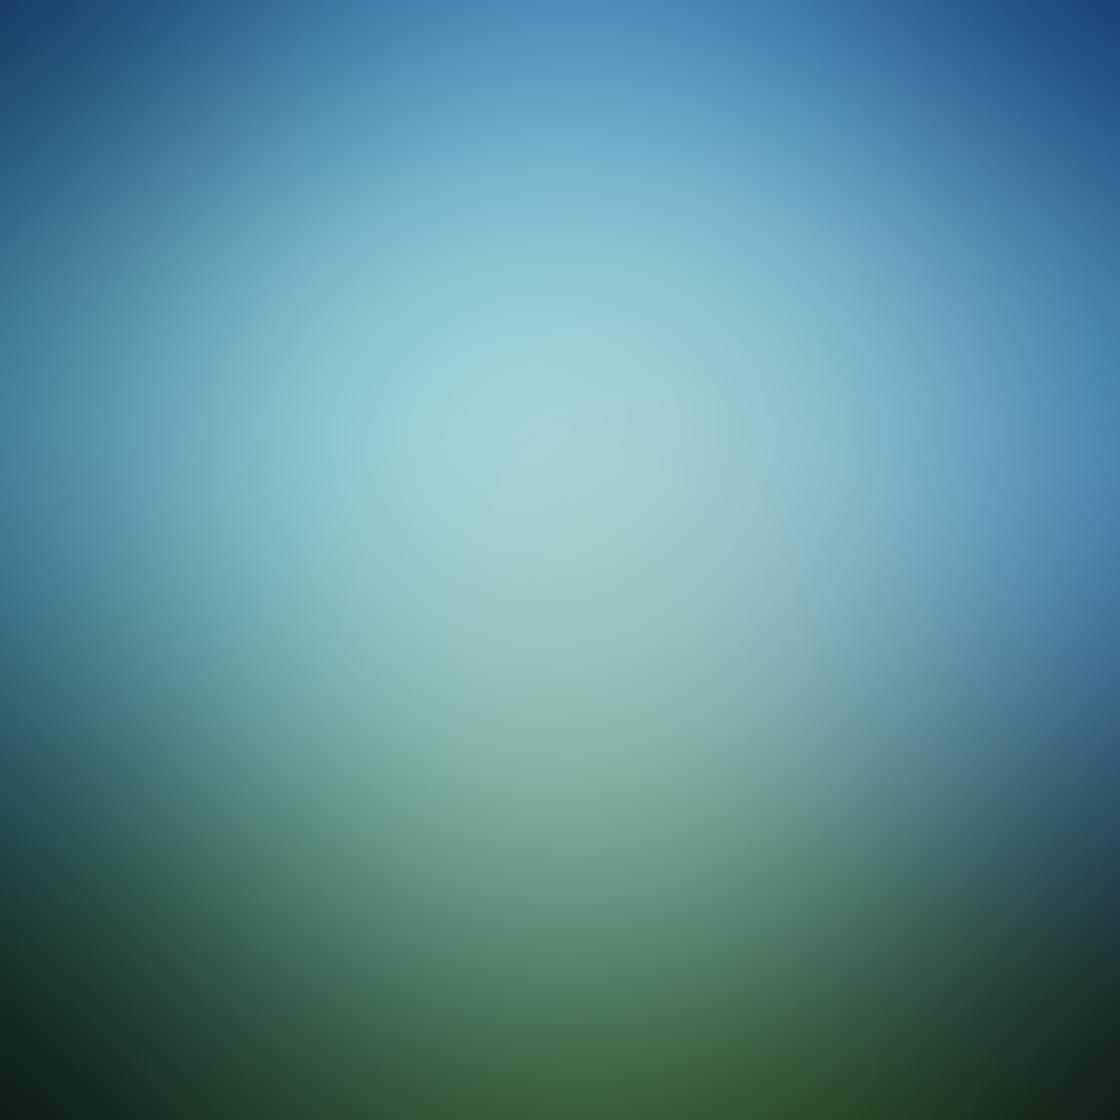 iPhone Angle Photo 23